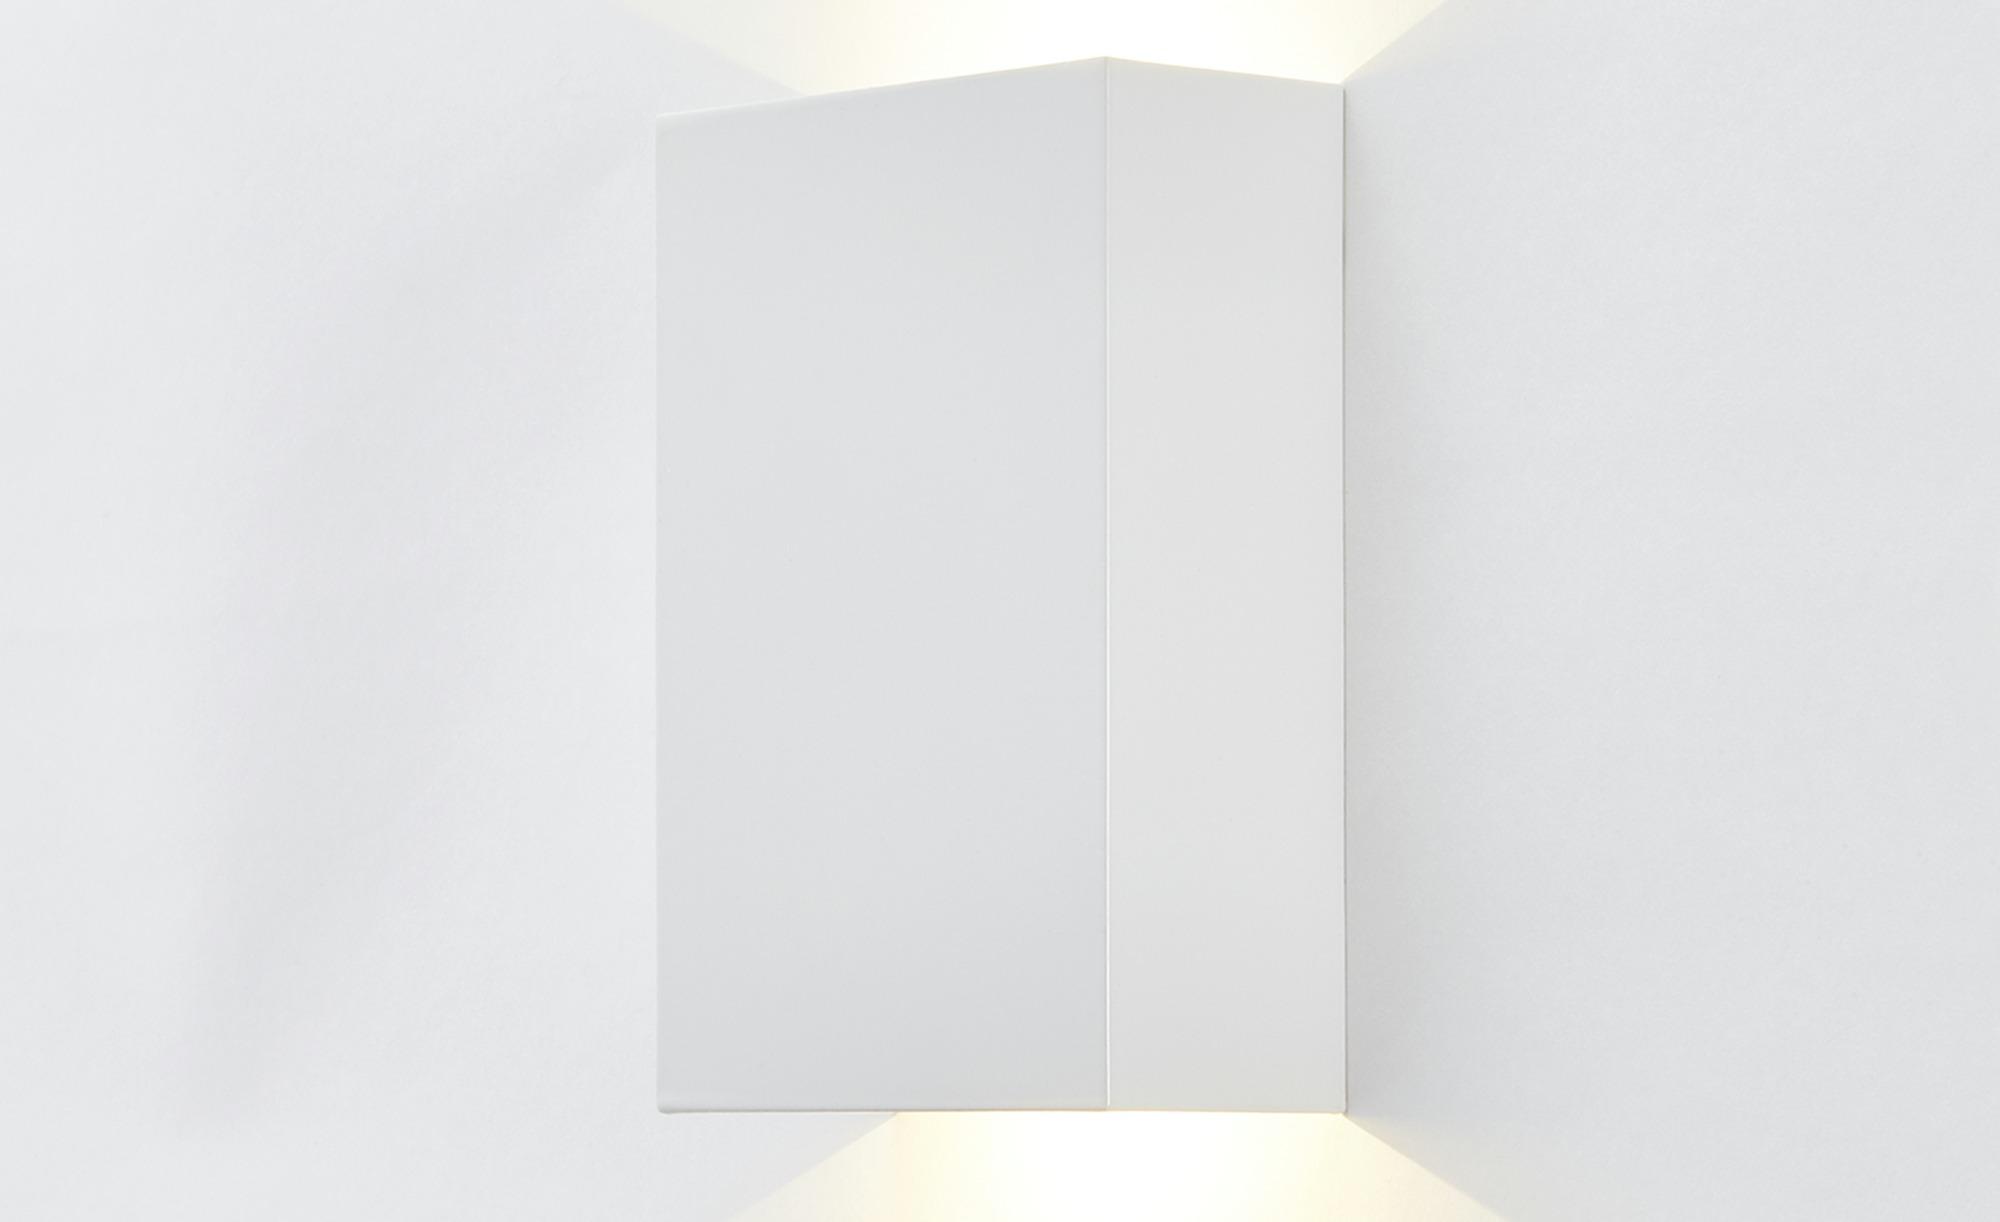 ML LED-Wandleuchte, 2-flammig Weiß ¦ weiß ¦ Maße (cm): B: 10 H: 4,7 Lampen & Leuchten > Innenleuchten > Wandleuchten - Höffner